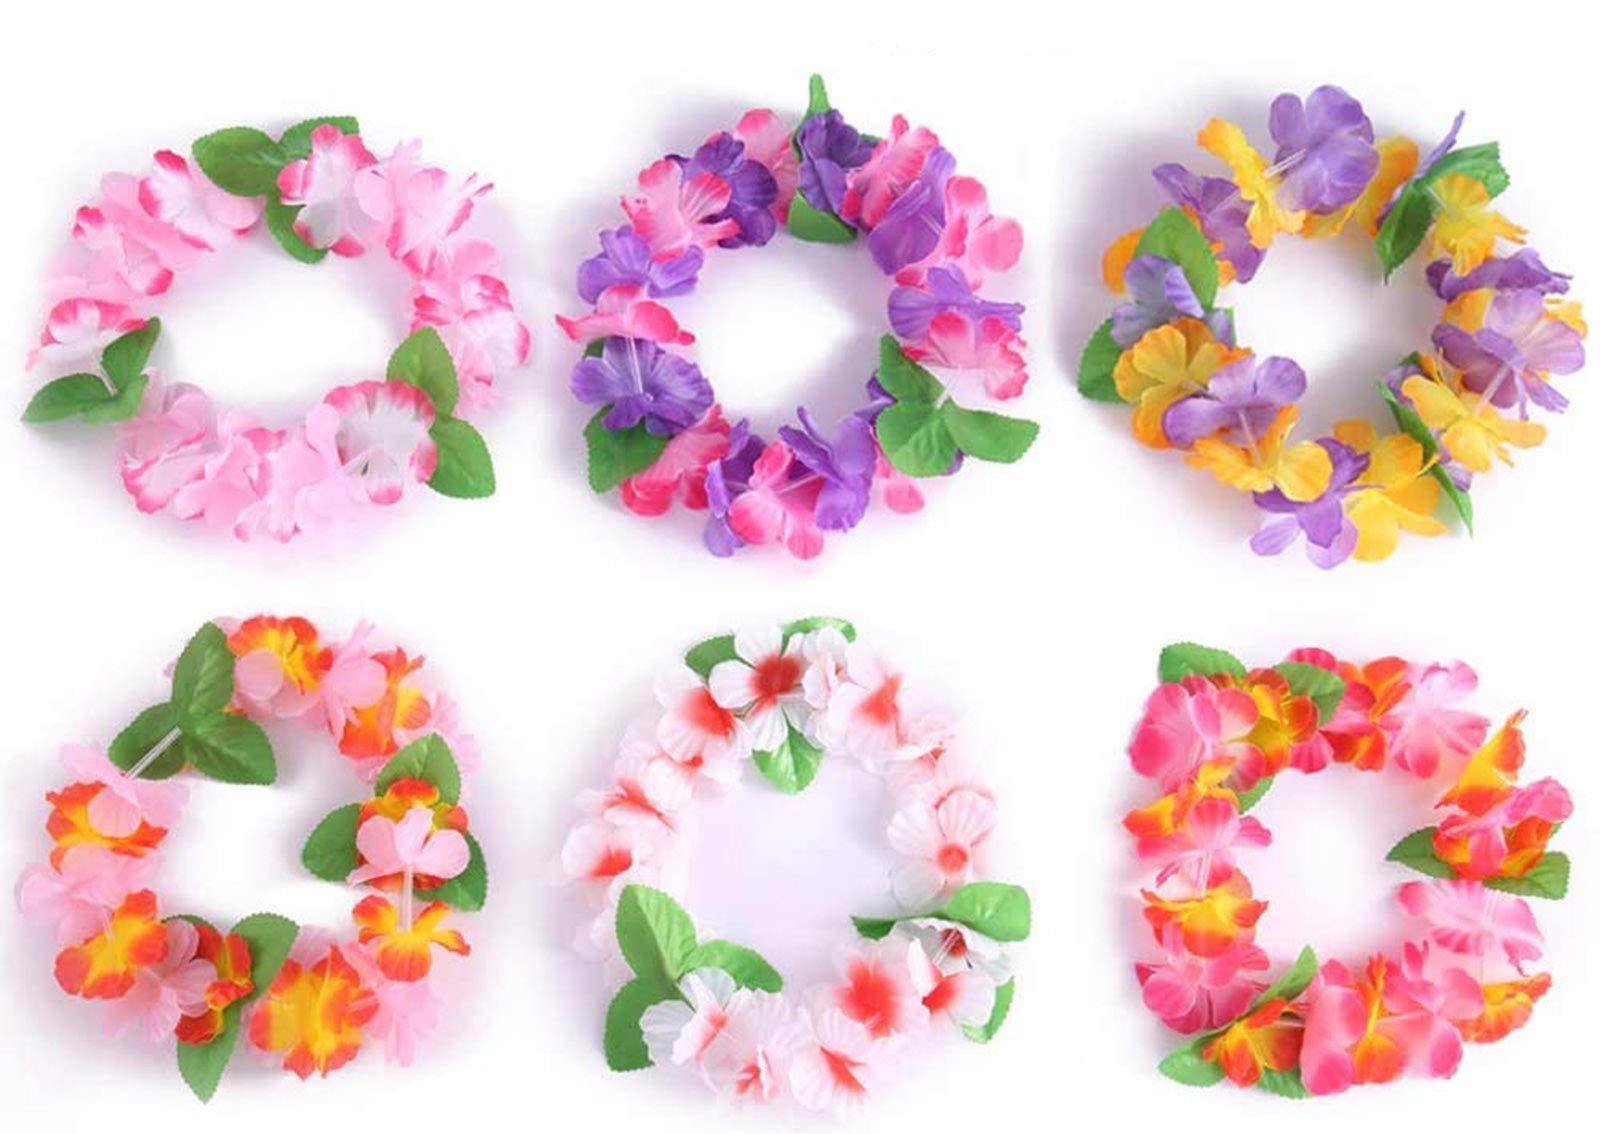 jollylife 40PCS Luau Tropical Hawaiian Headband Headpiece Leis- Summer/Tiki/Pool Mahalo Flower Party Decorations Favors Supplies